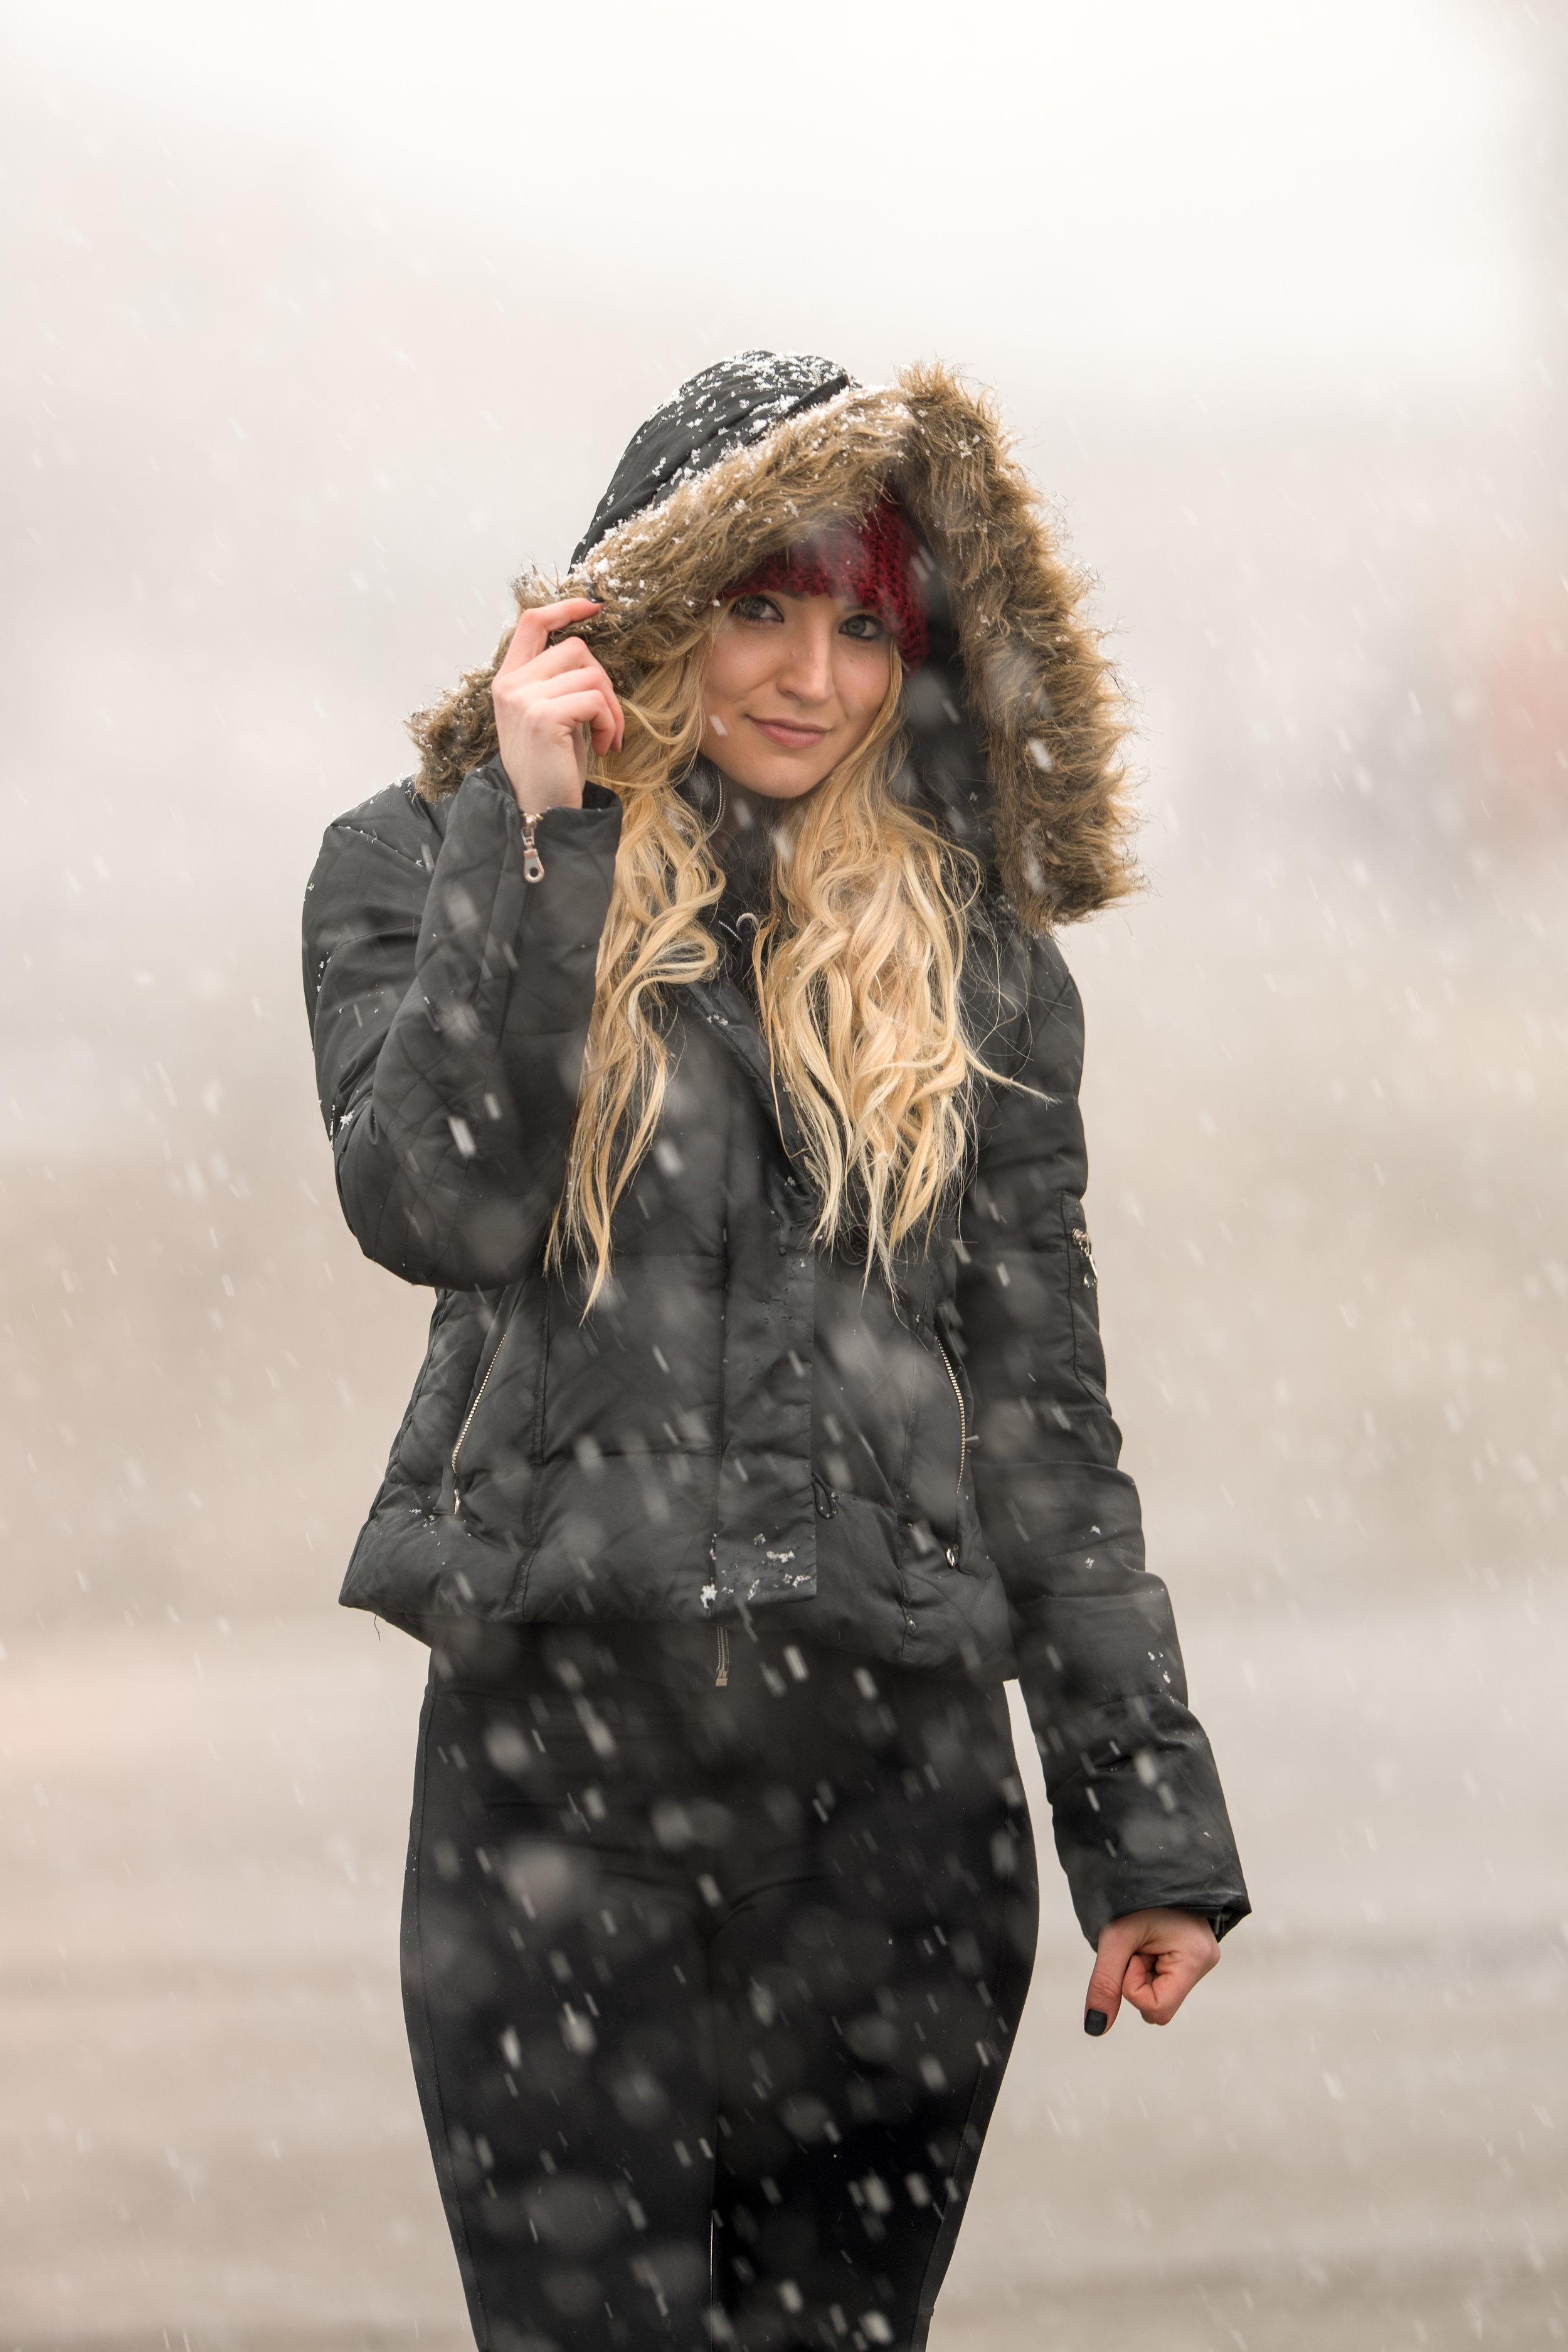 Kaereilly Snow Shoot_ (1).jpg